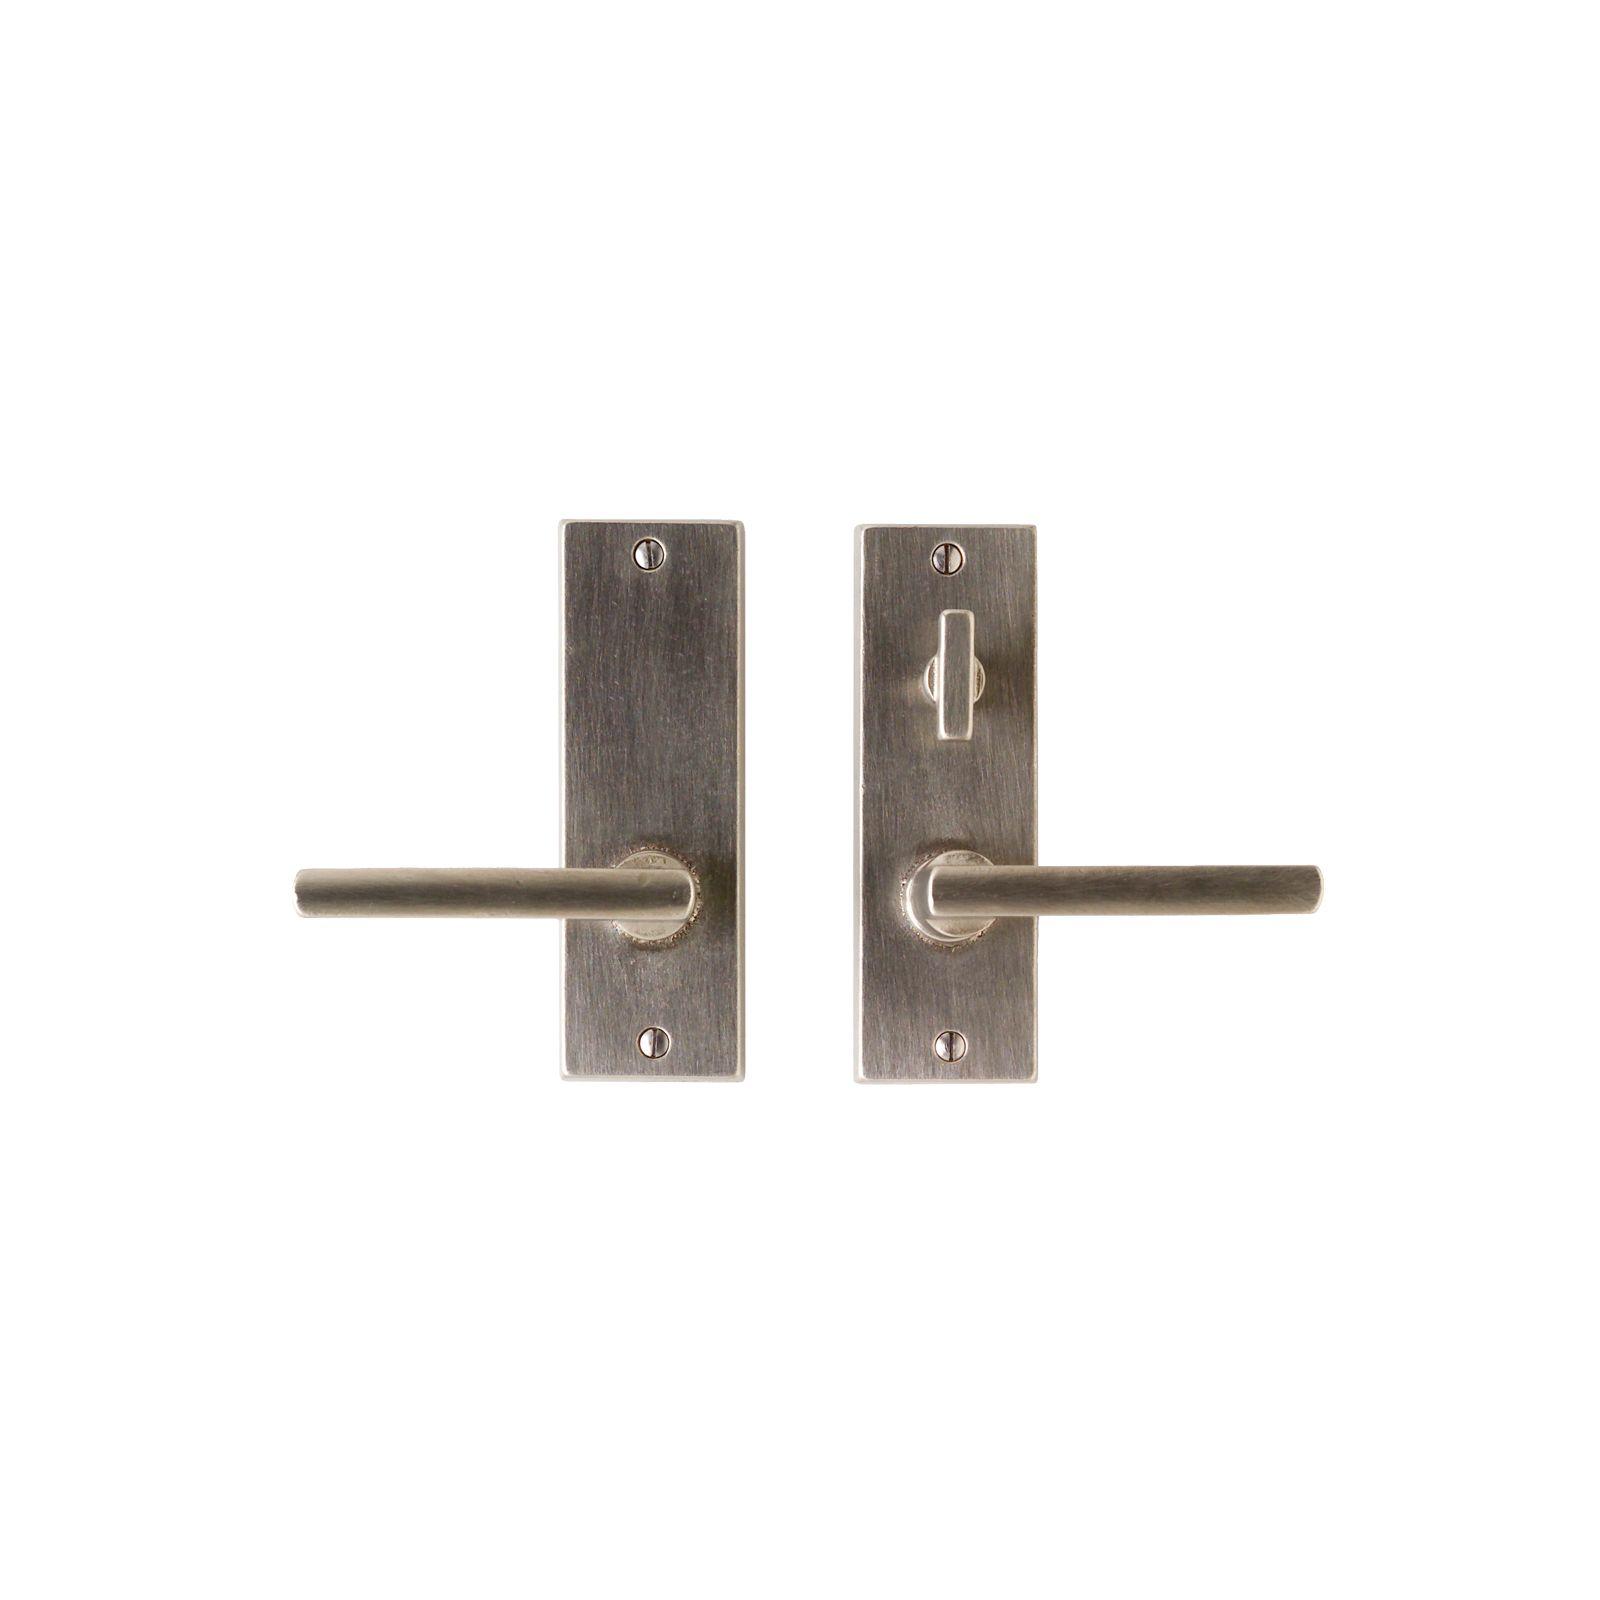 Modern Rectangular Pocket Door Mortise Lock Emtek Products Inc